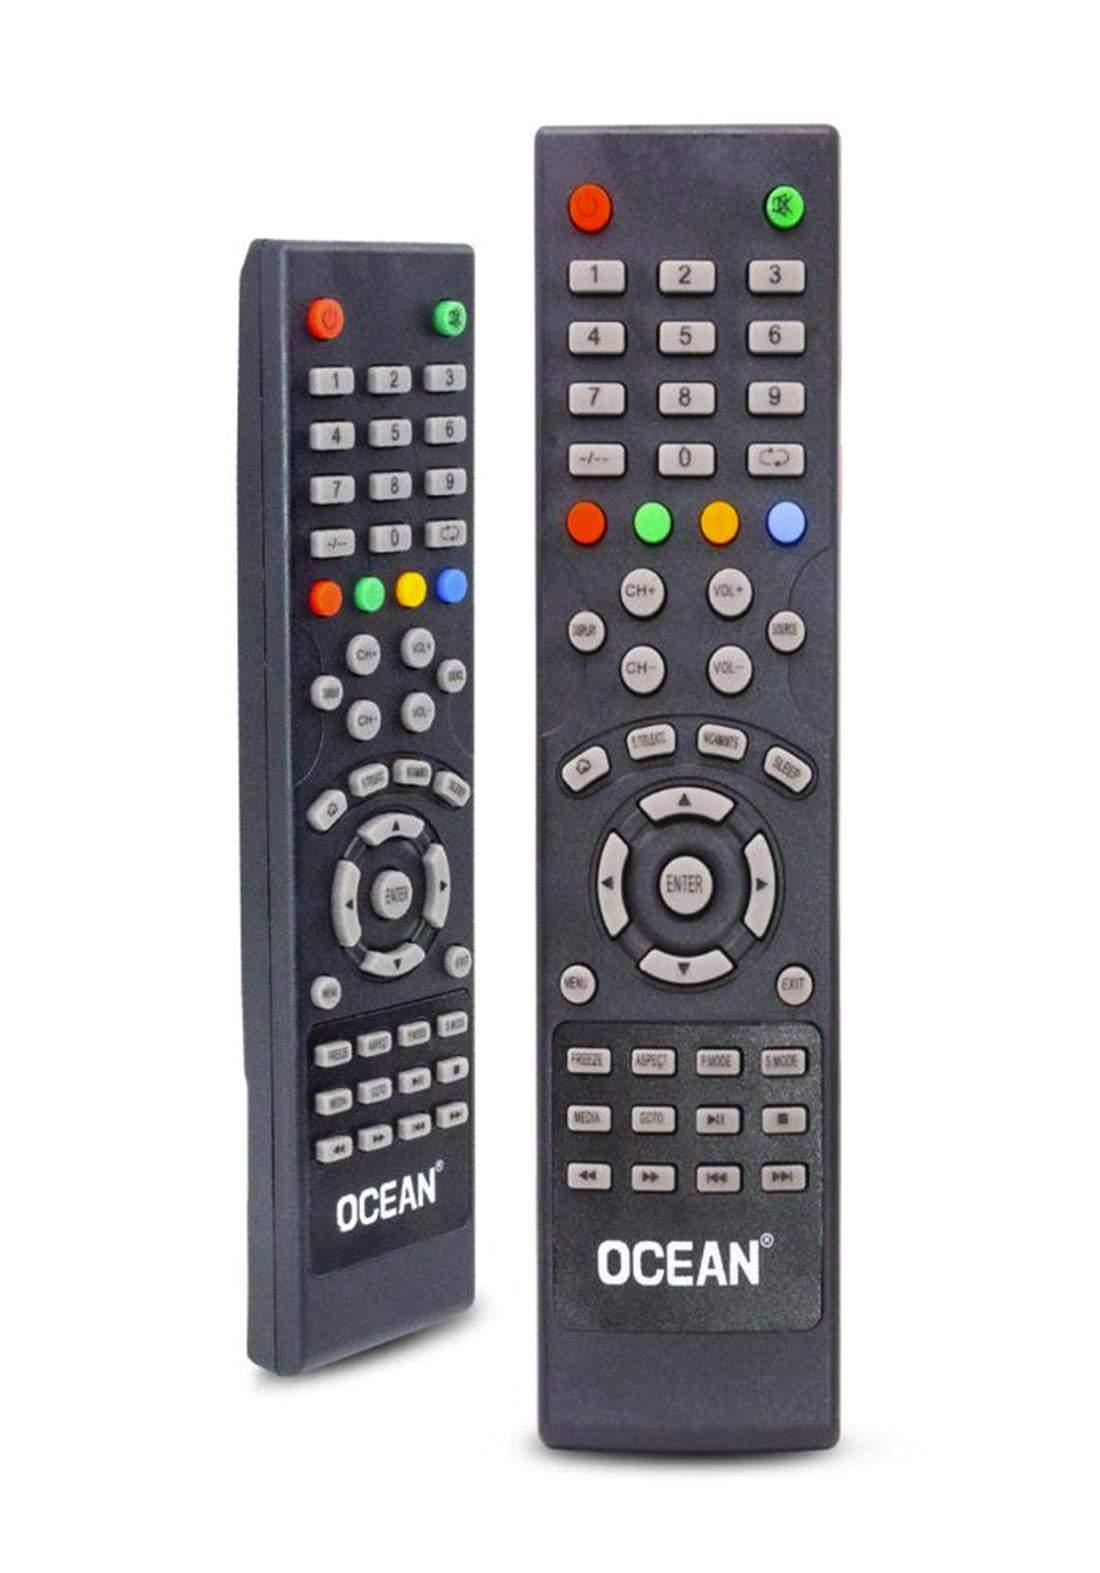 Remote Control For Ocean Plasma TV (A-935) جهاز تحكم عن بعد